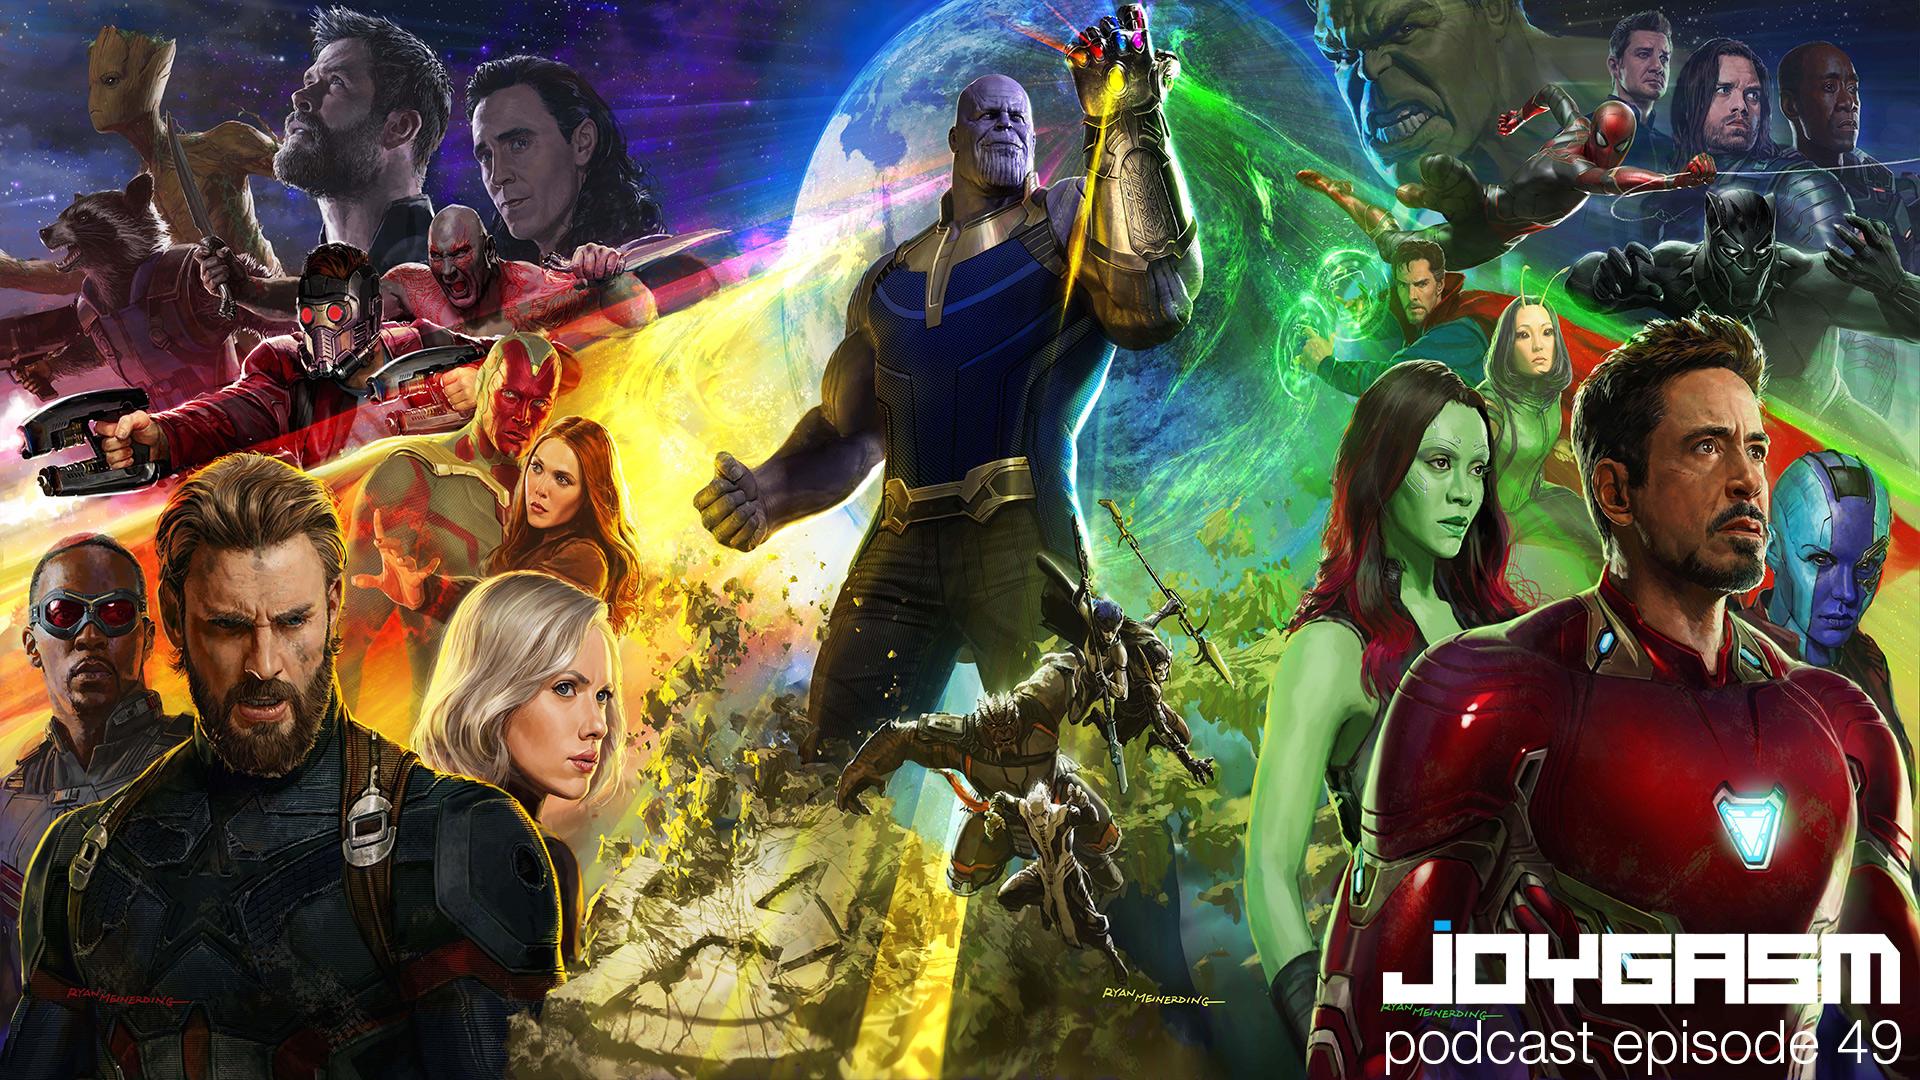 Joygasm Podcast Ep. 49: Avengers Infinity War Trailer Reaction & More